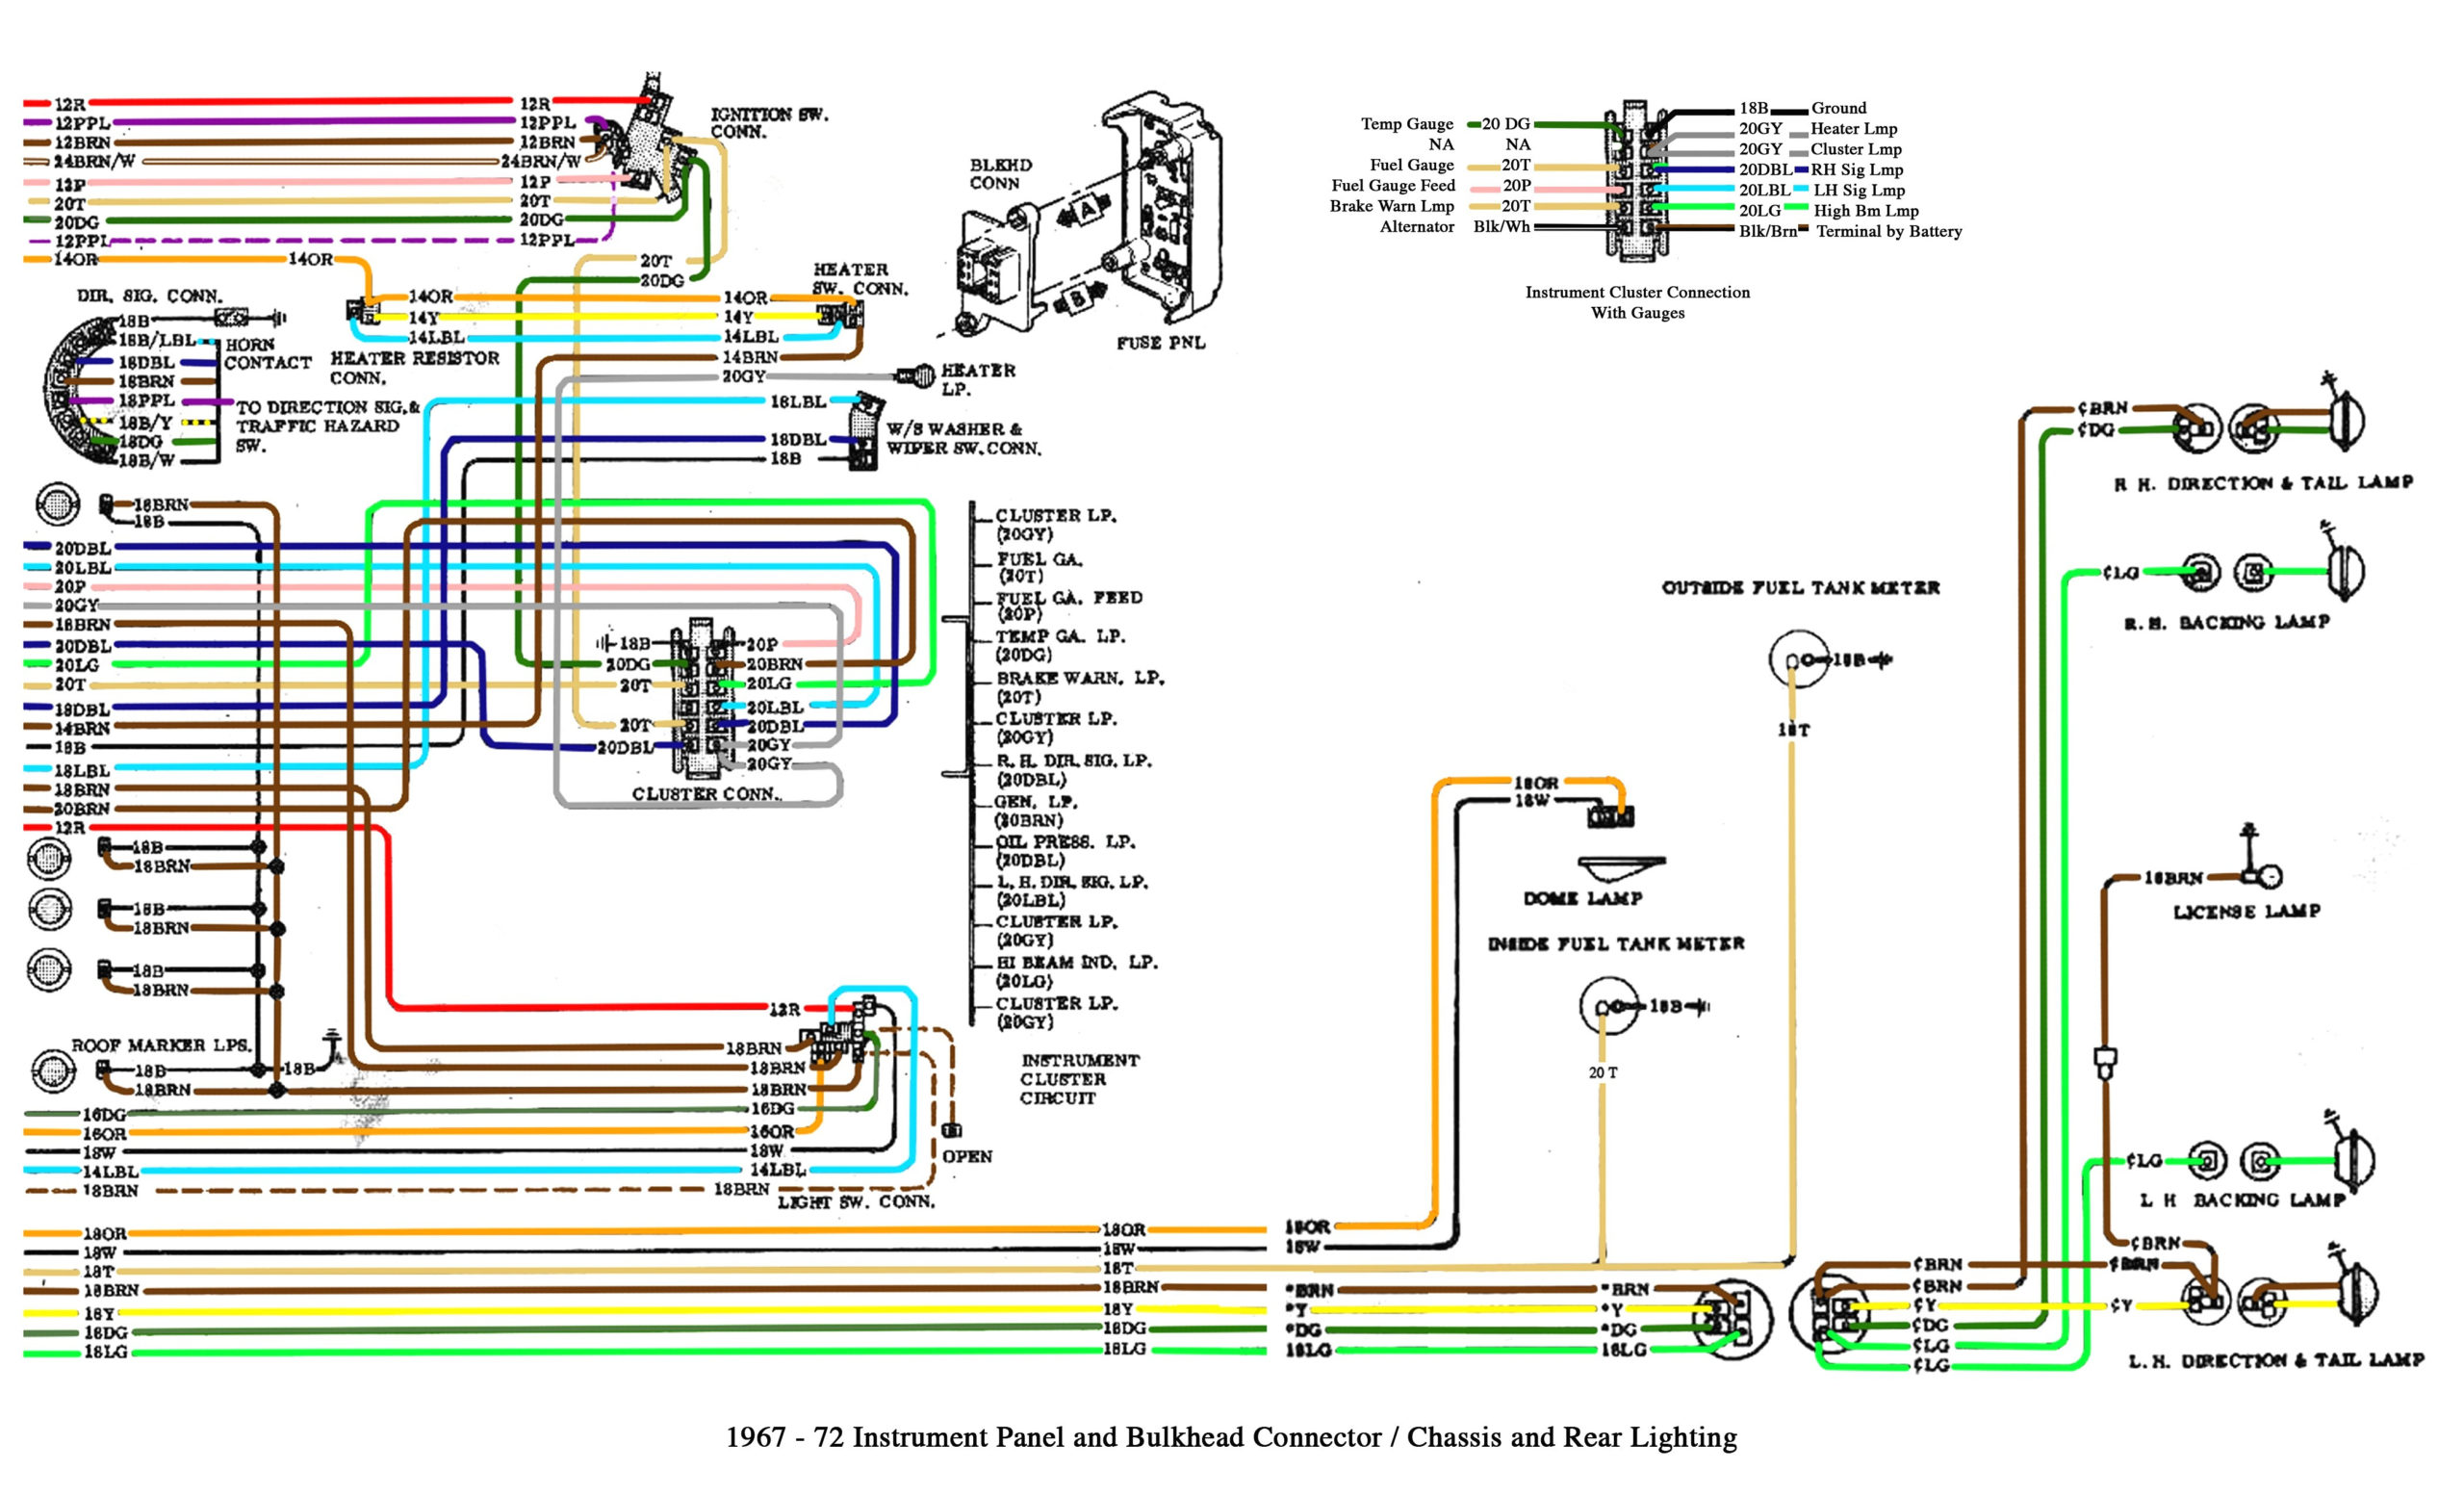 2003 Chevy Trailer Wiring Diagram